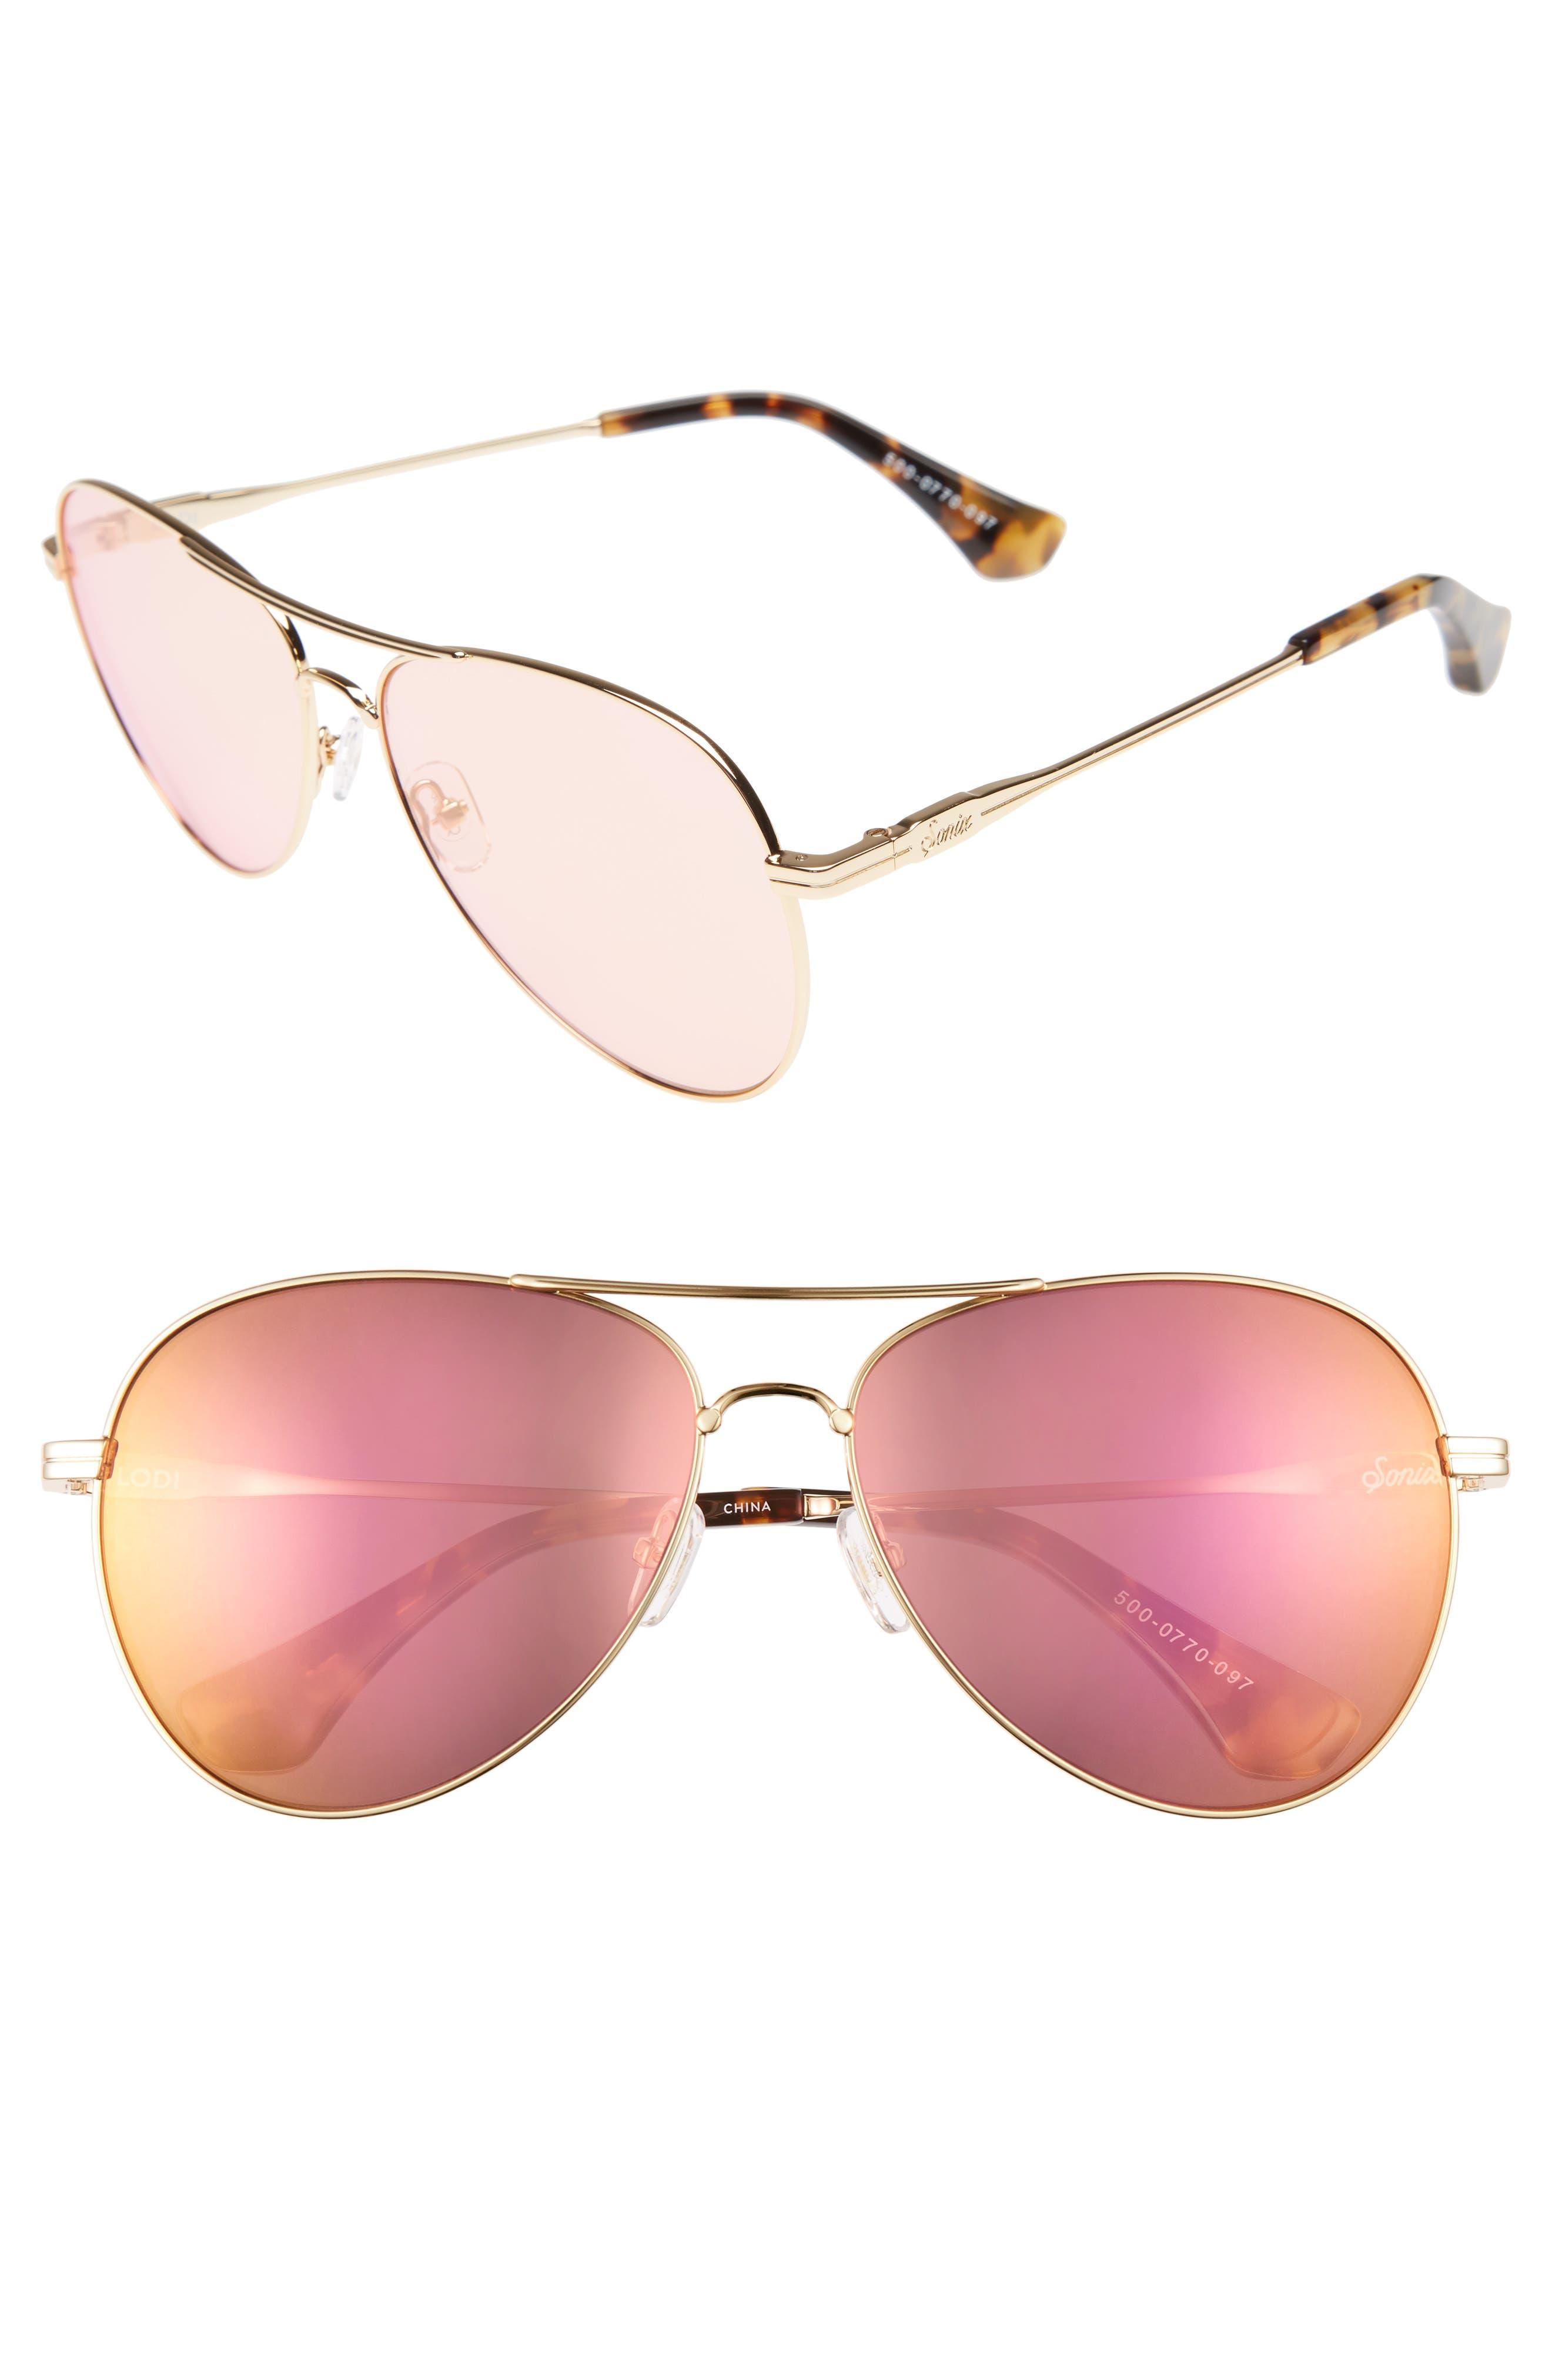 Alternate Image 1 Selected - Sonix Lodi 61mm Mirrored Aviator Sunglasses